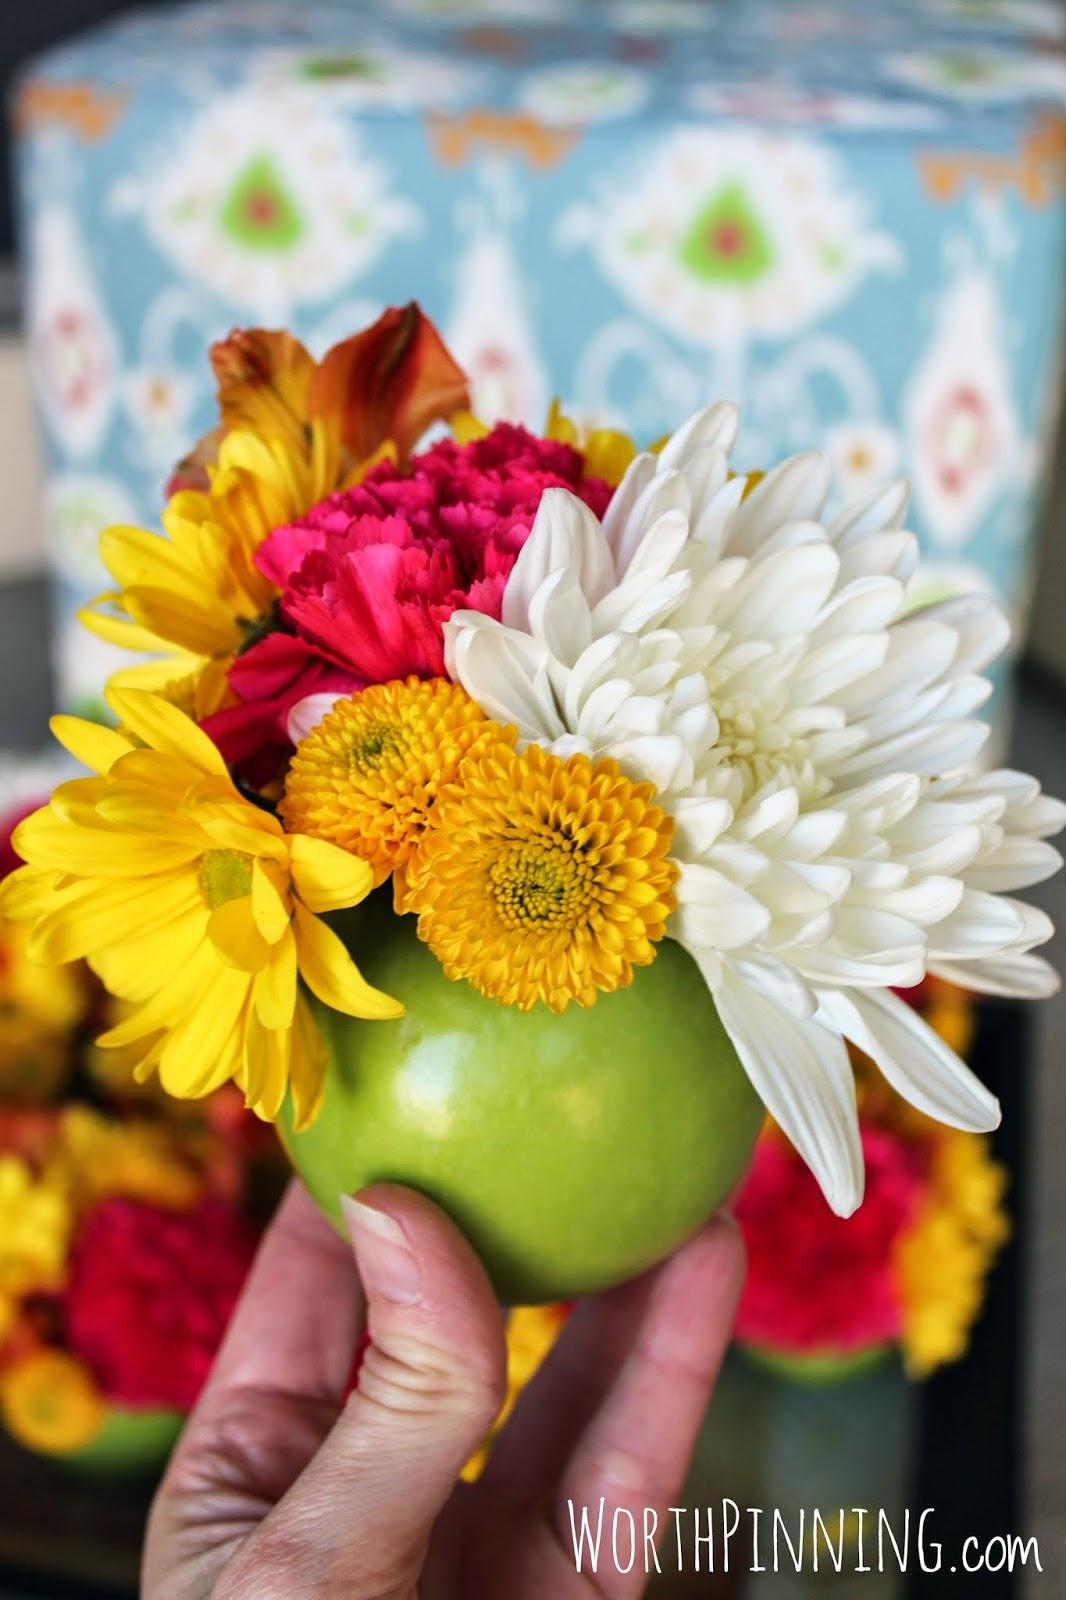 Worth Pinning Apple Vase Flower Arrangement